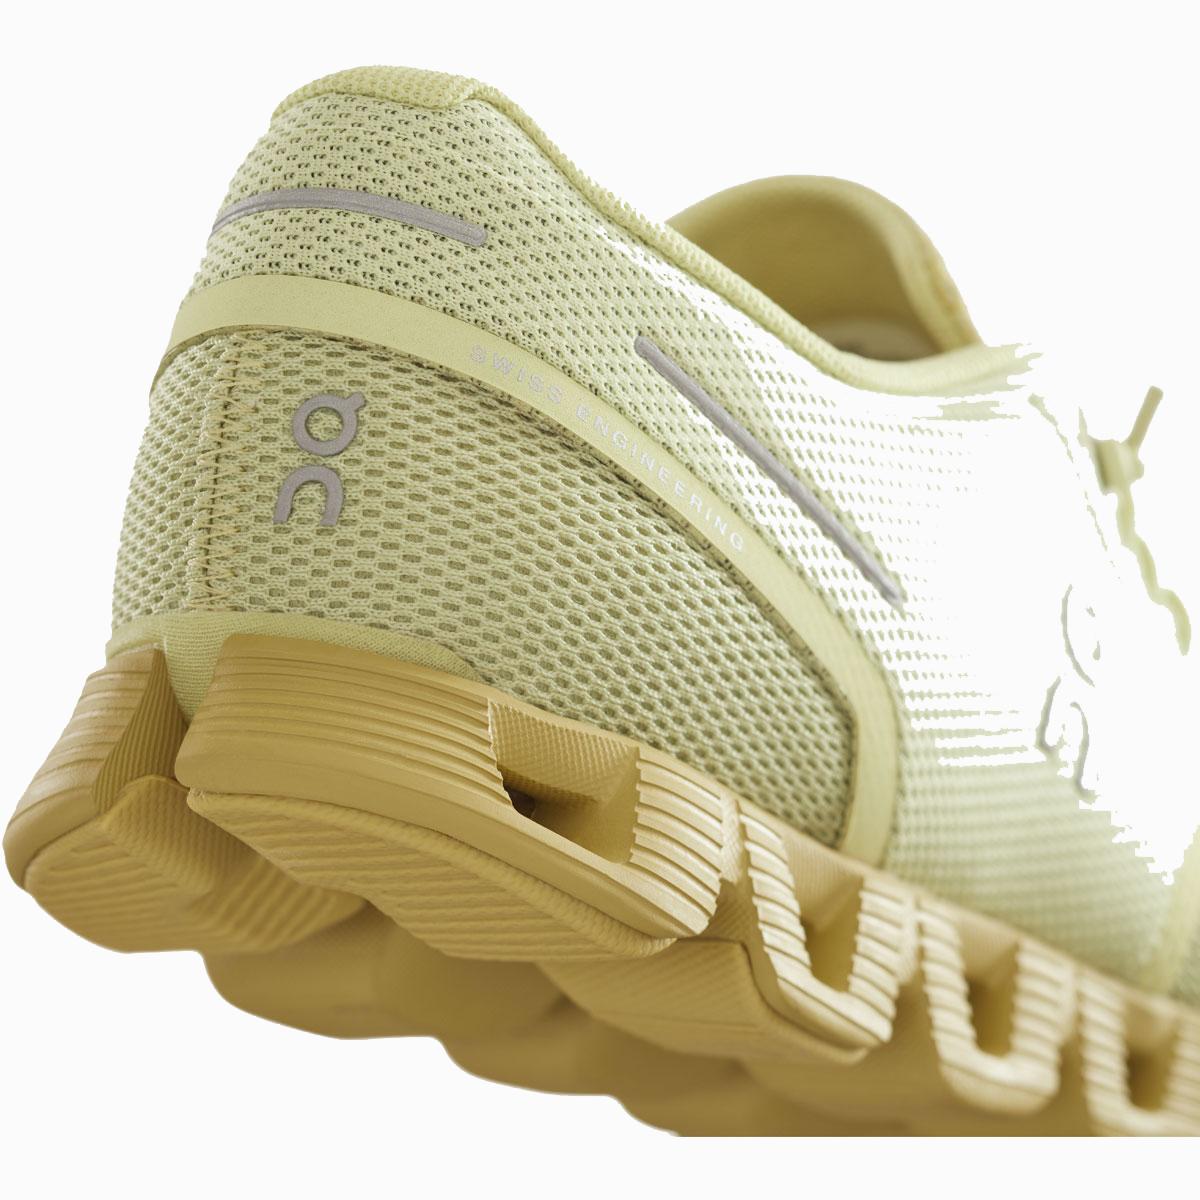 Women's On Cloud Monochrome Running Shoe - Color: Endive - Size: 5 - Width: Regular, Endive, large, image 4